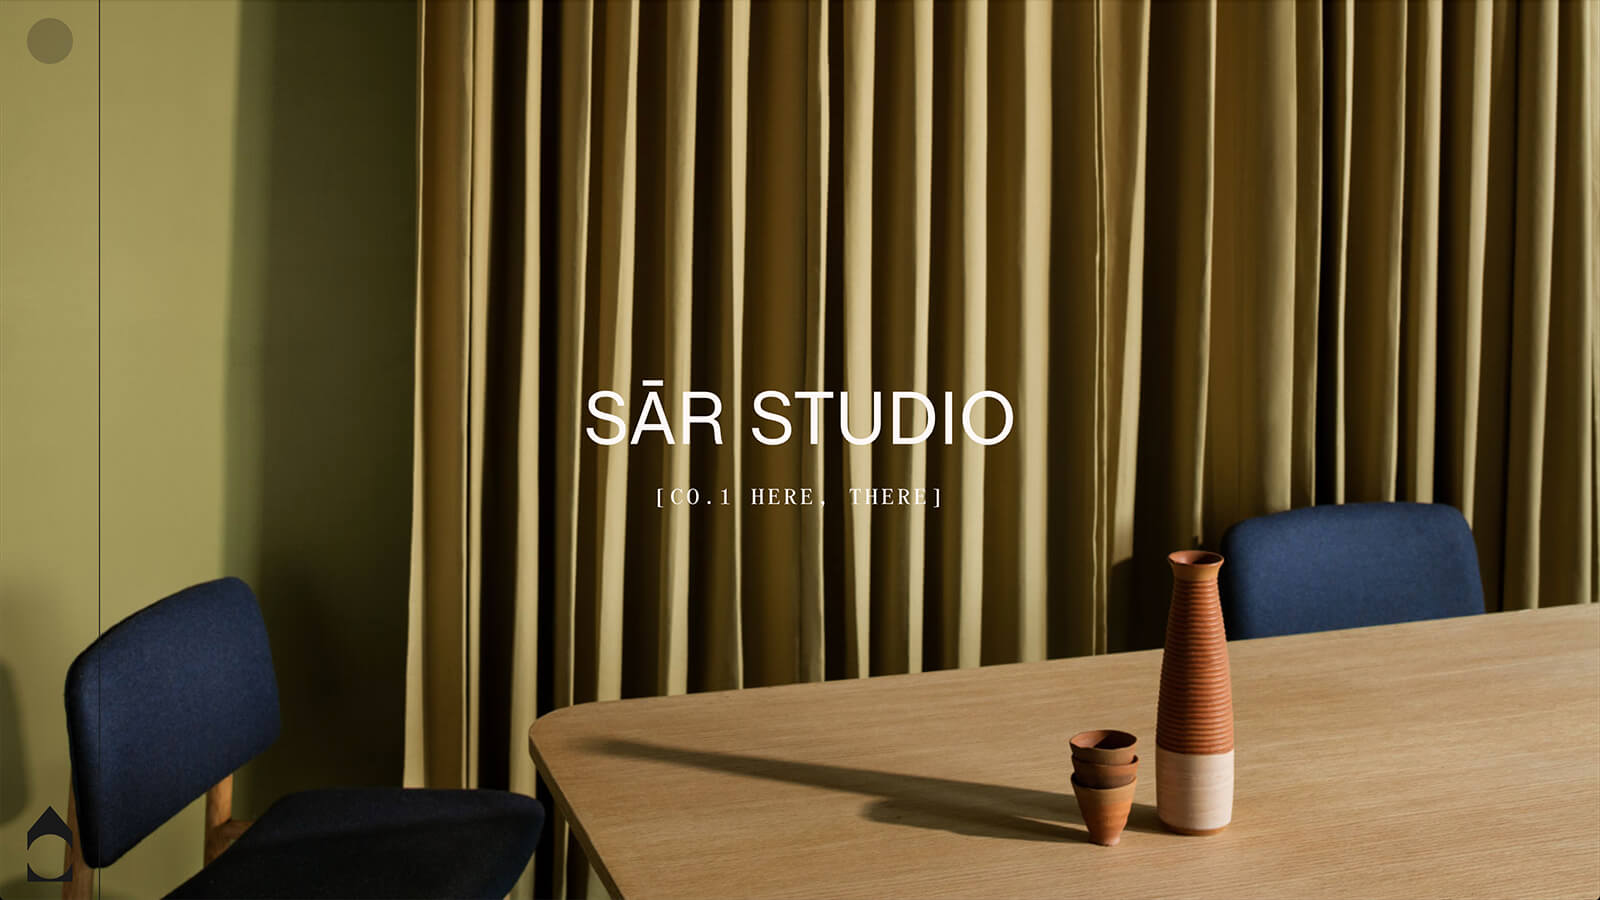 Sar Studio